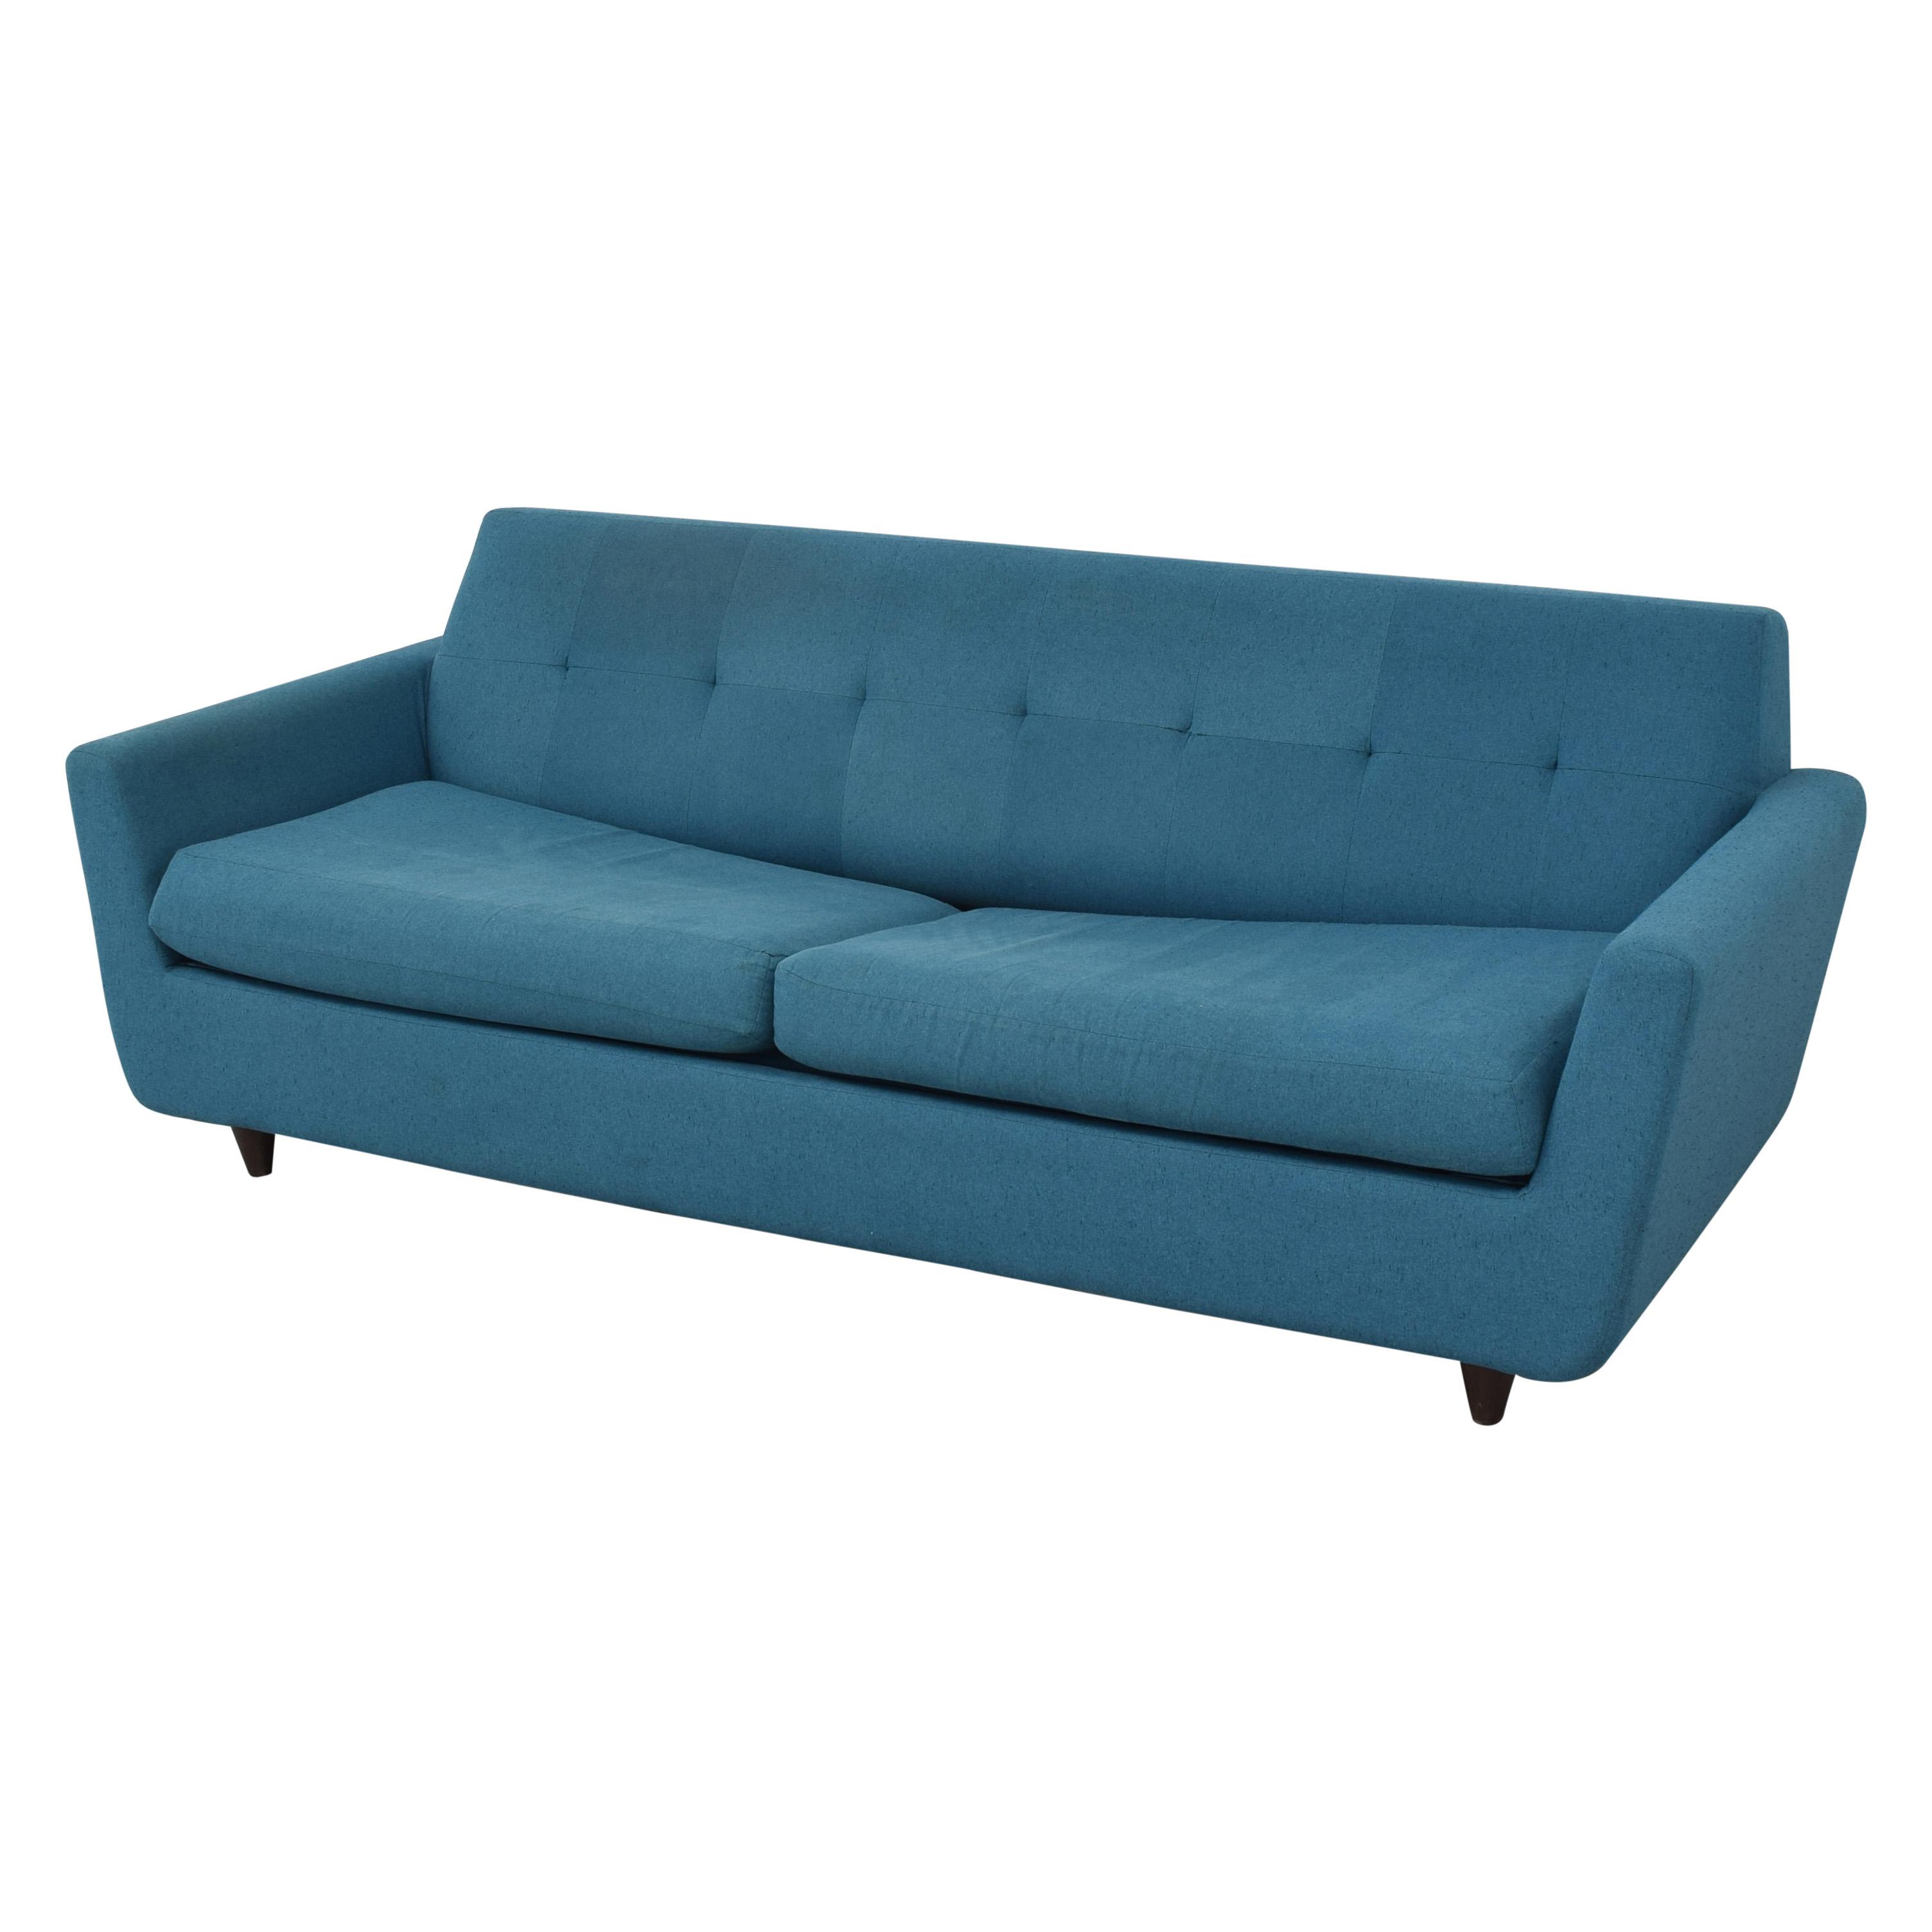 Joybird Joybird Hughes Sleeper Sofa nyc